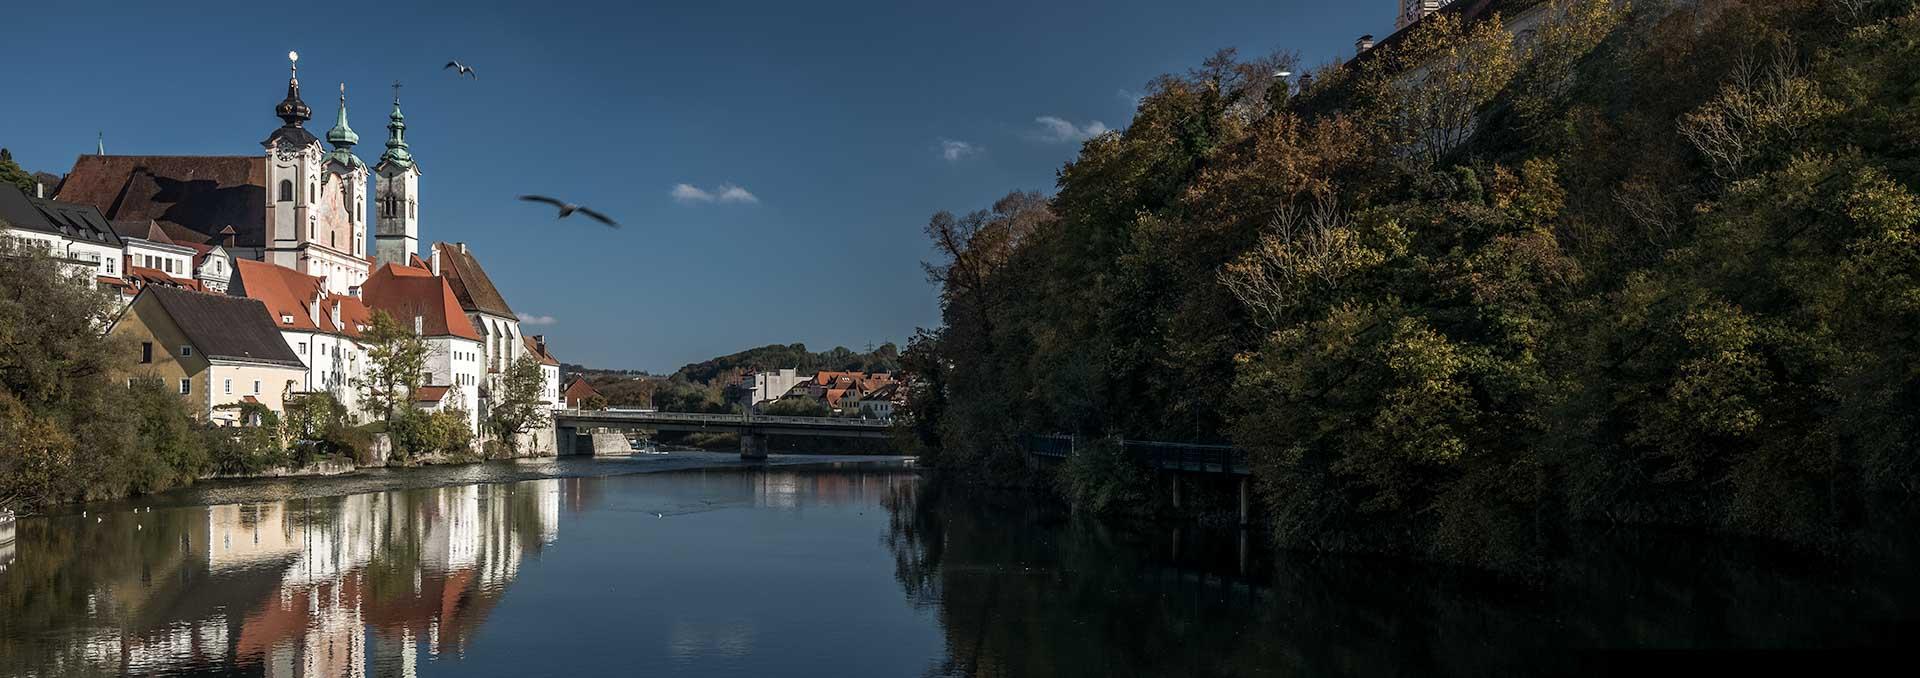 stadt-header-c-ooe-tourismus-gmbh-robert-maybach